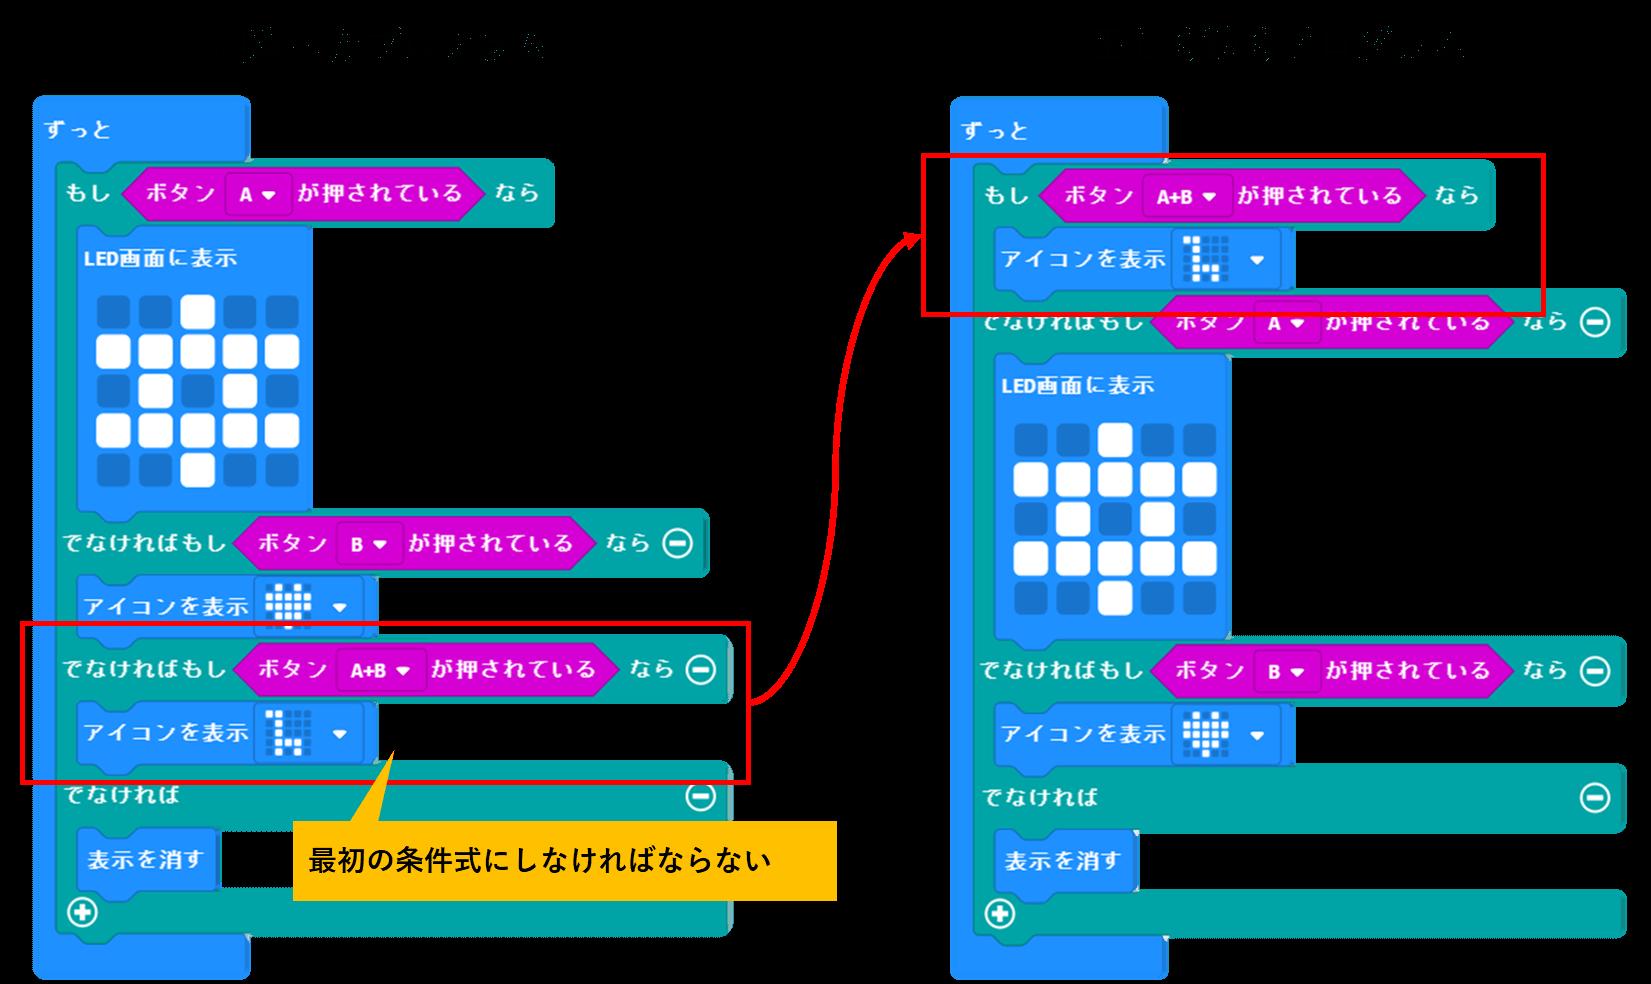 AとBを押したときのプログラムの正誤図